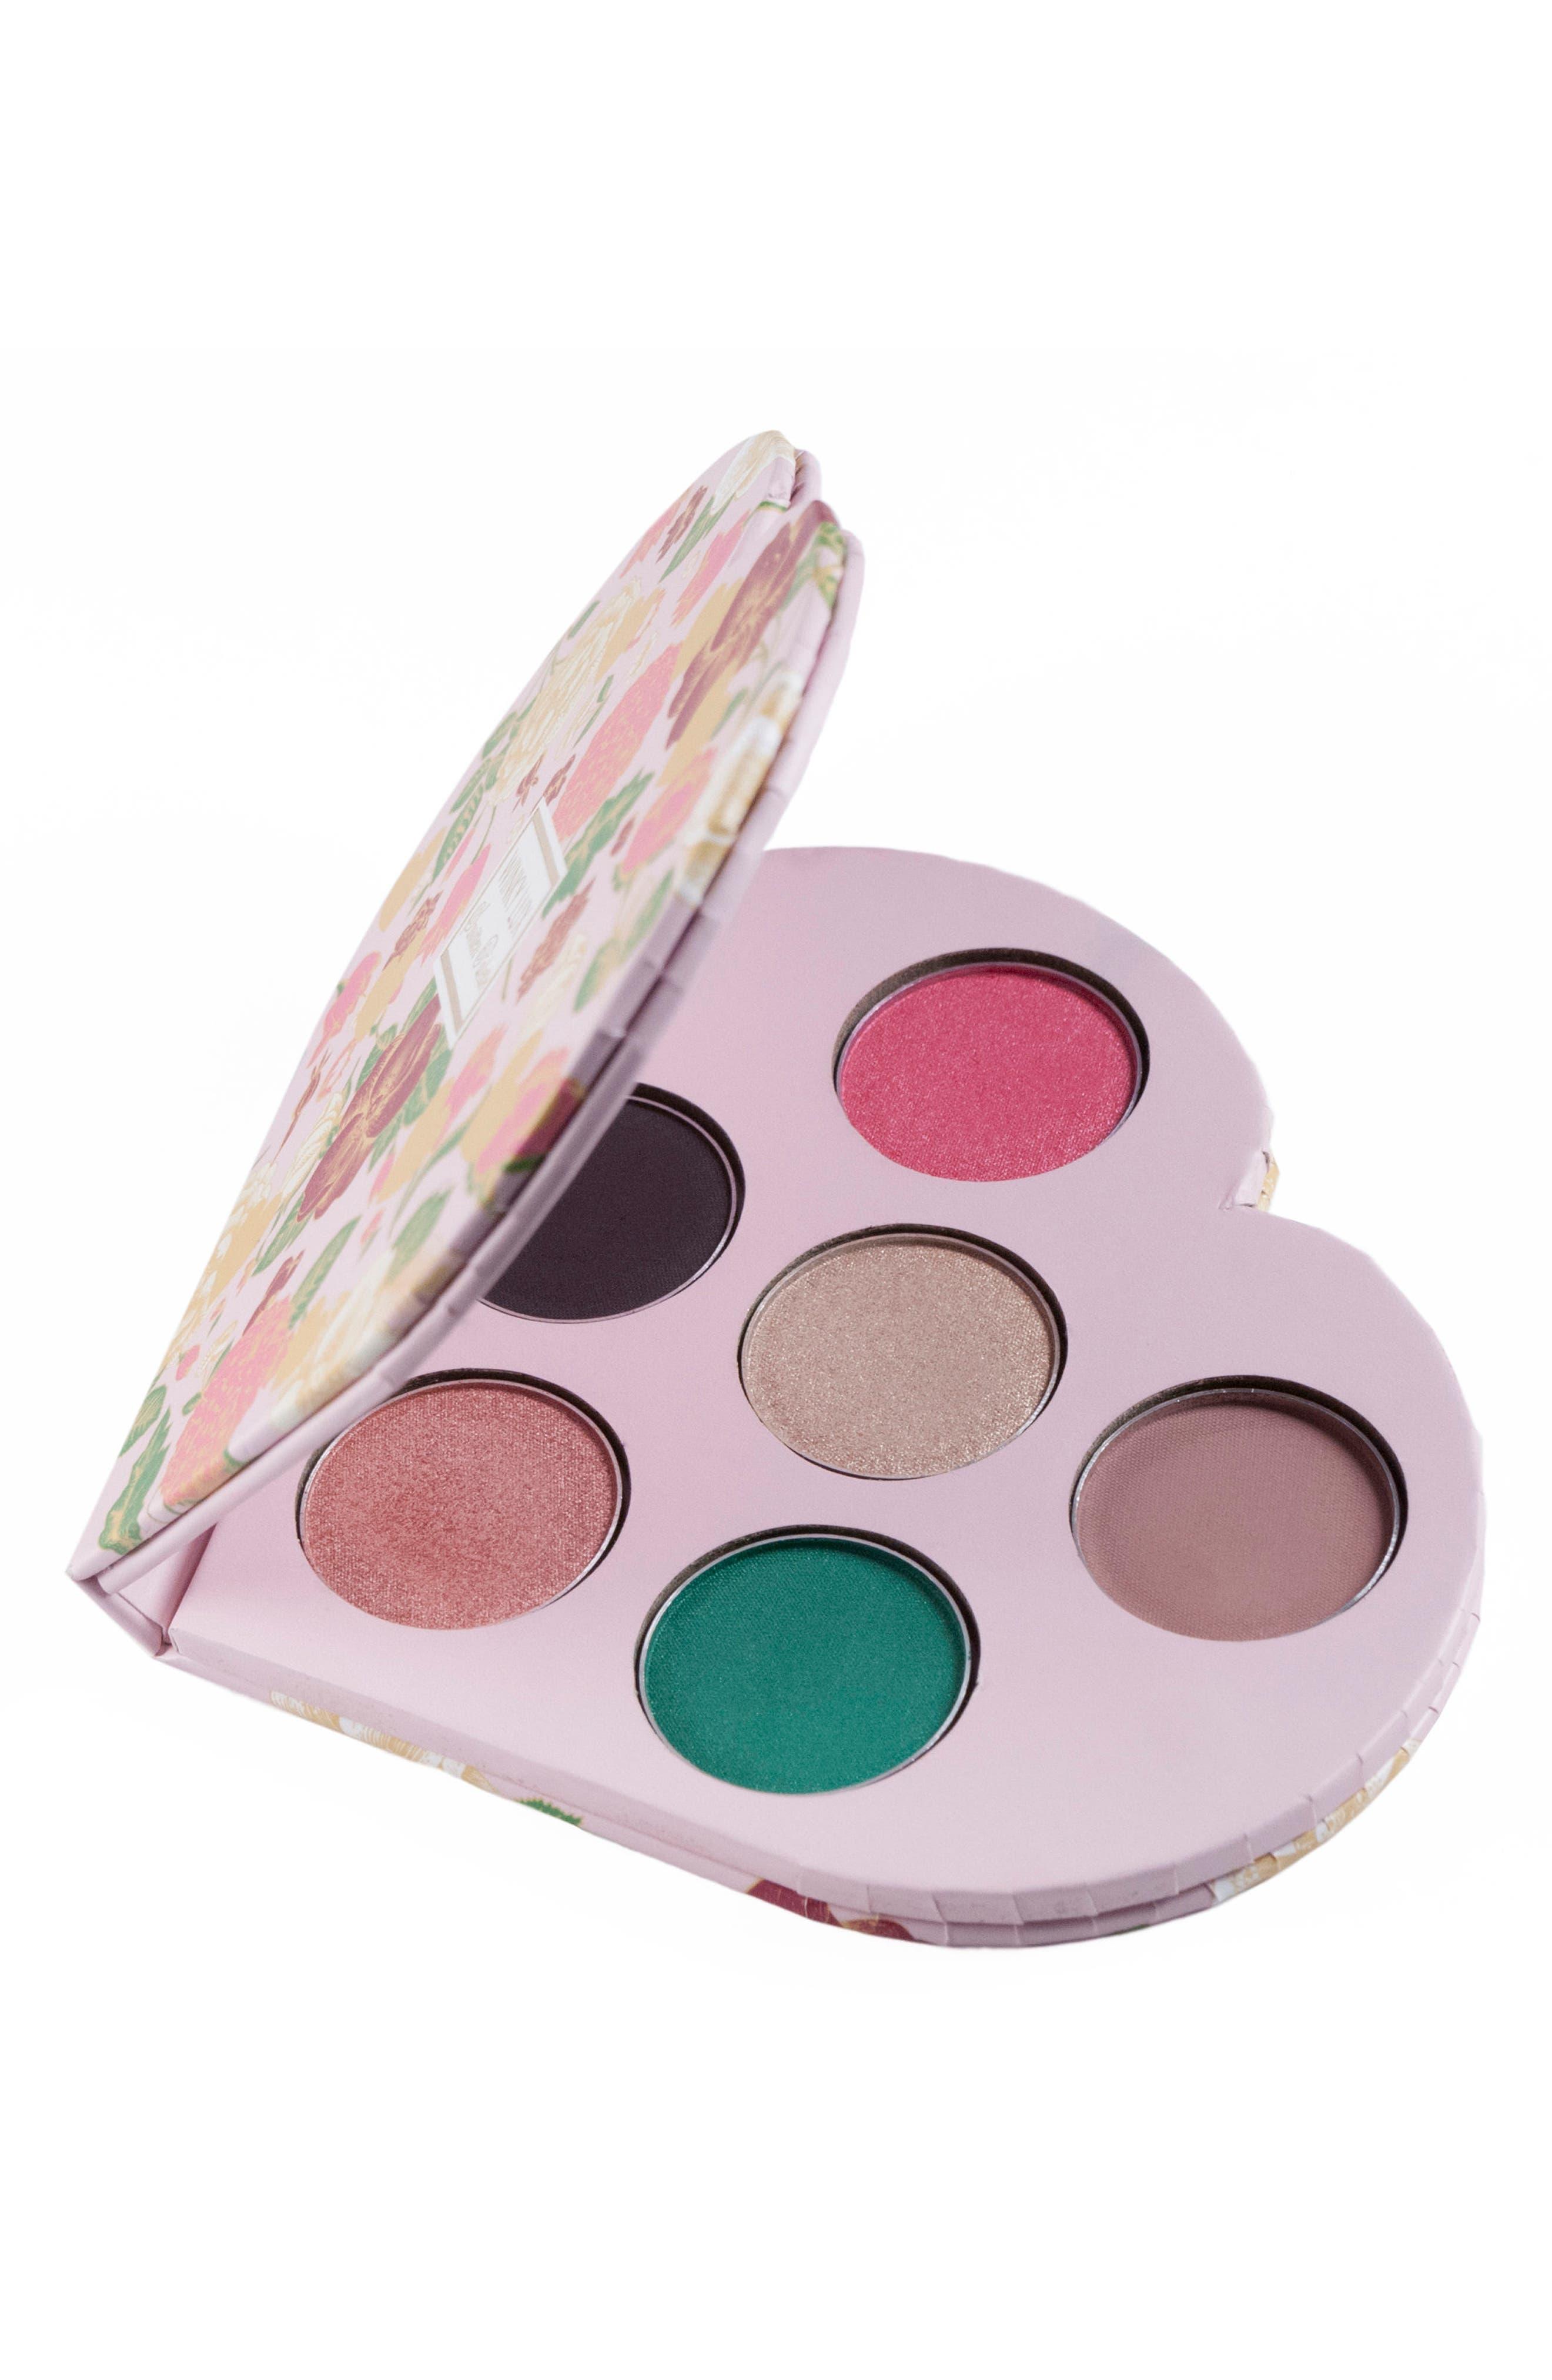 Smitten Heart Eyeshadow Palette,                         Main,                         color, No Color